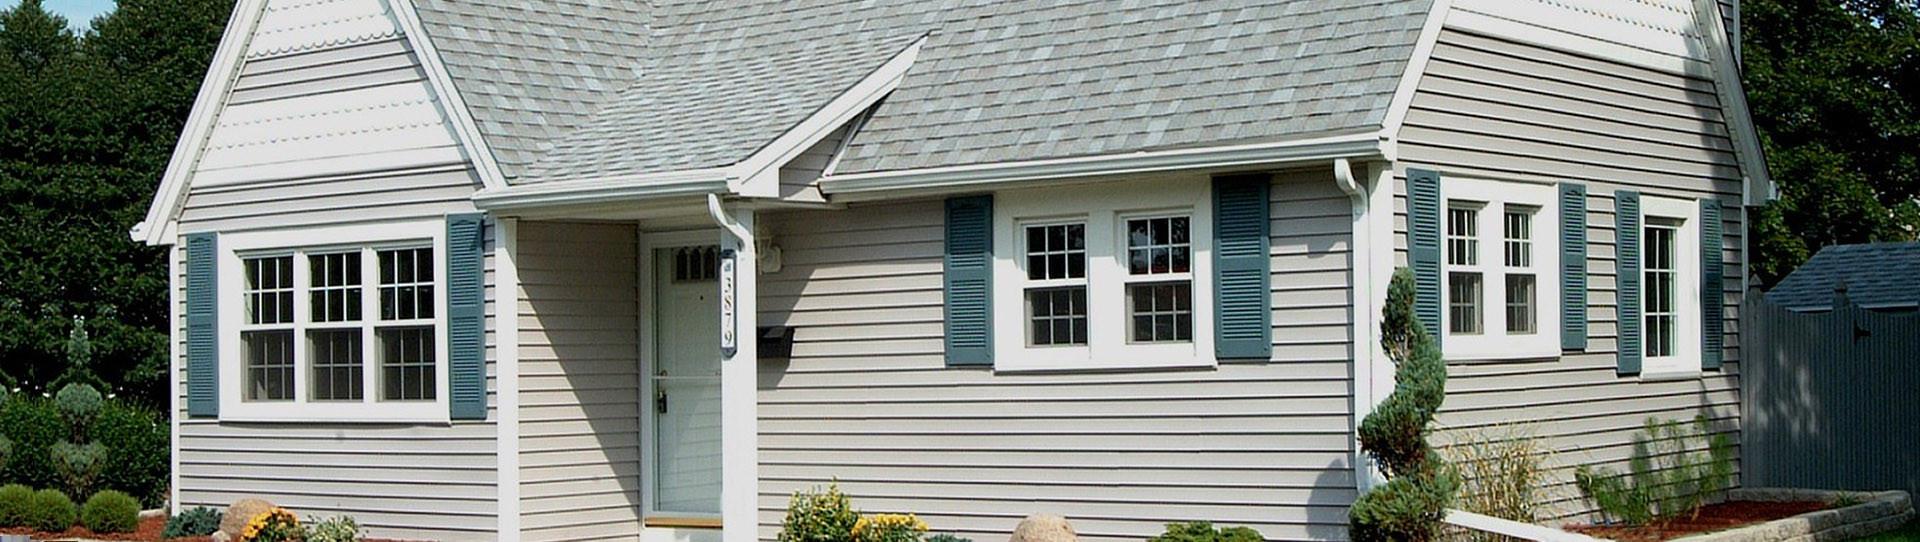 Ivy Lea Construction Buffalo Ny Home Improvement Contractors